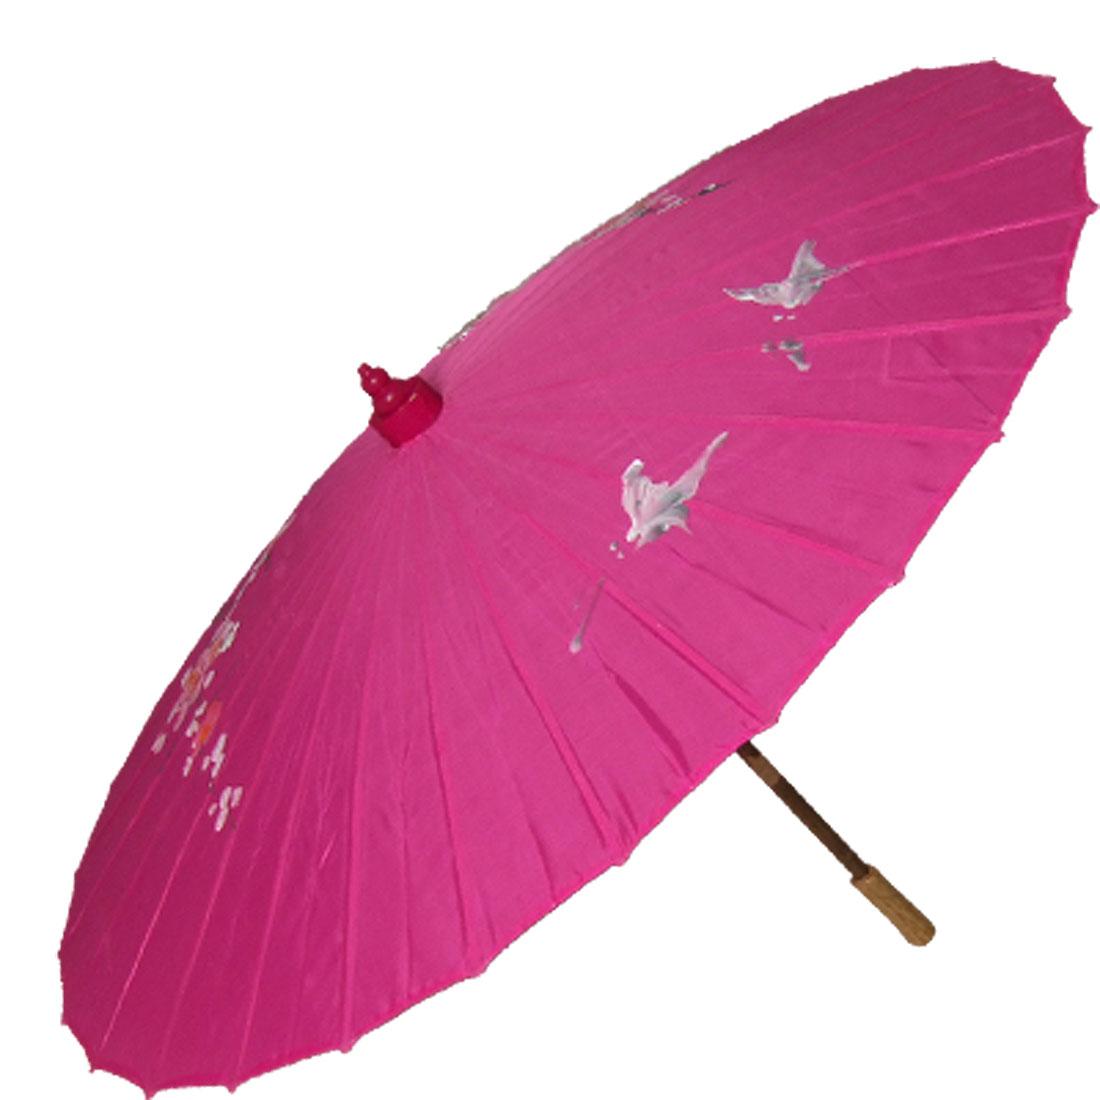 Plum Bloom Print Fuchsia Nylon Folding Parasol Umbrella